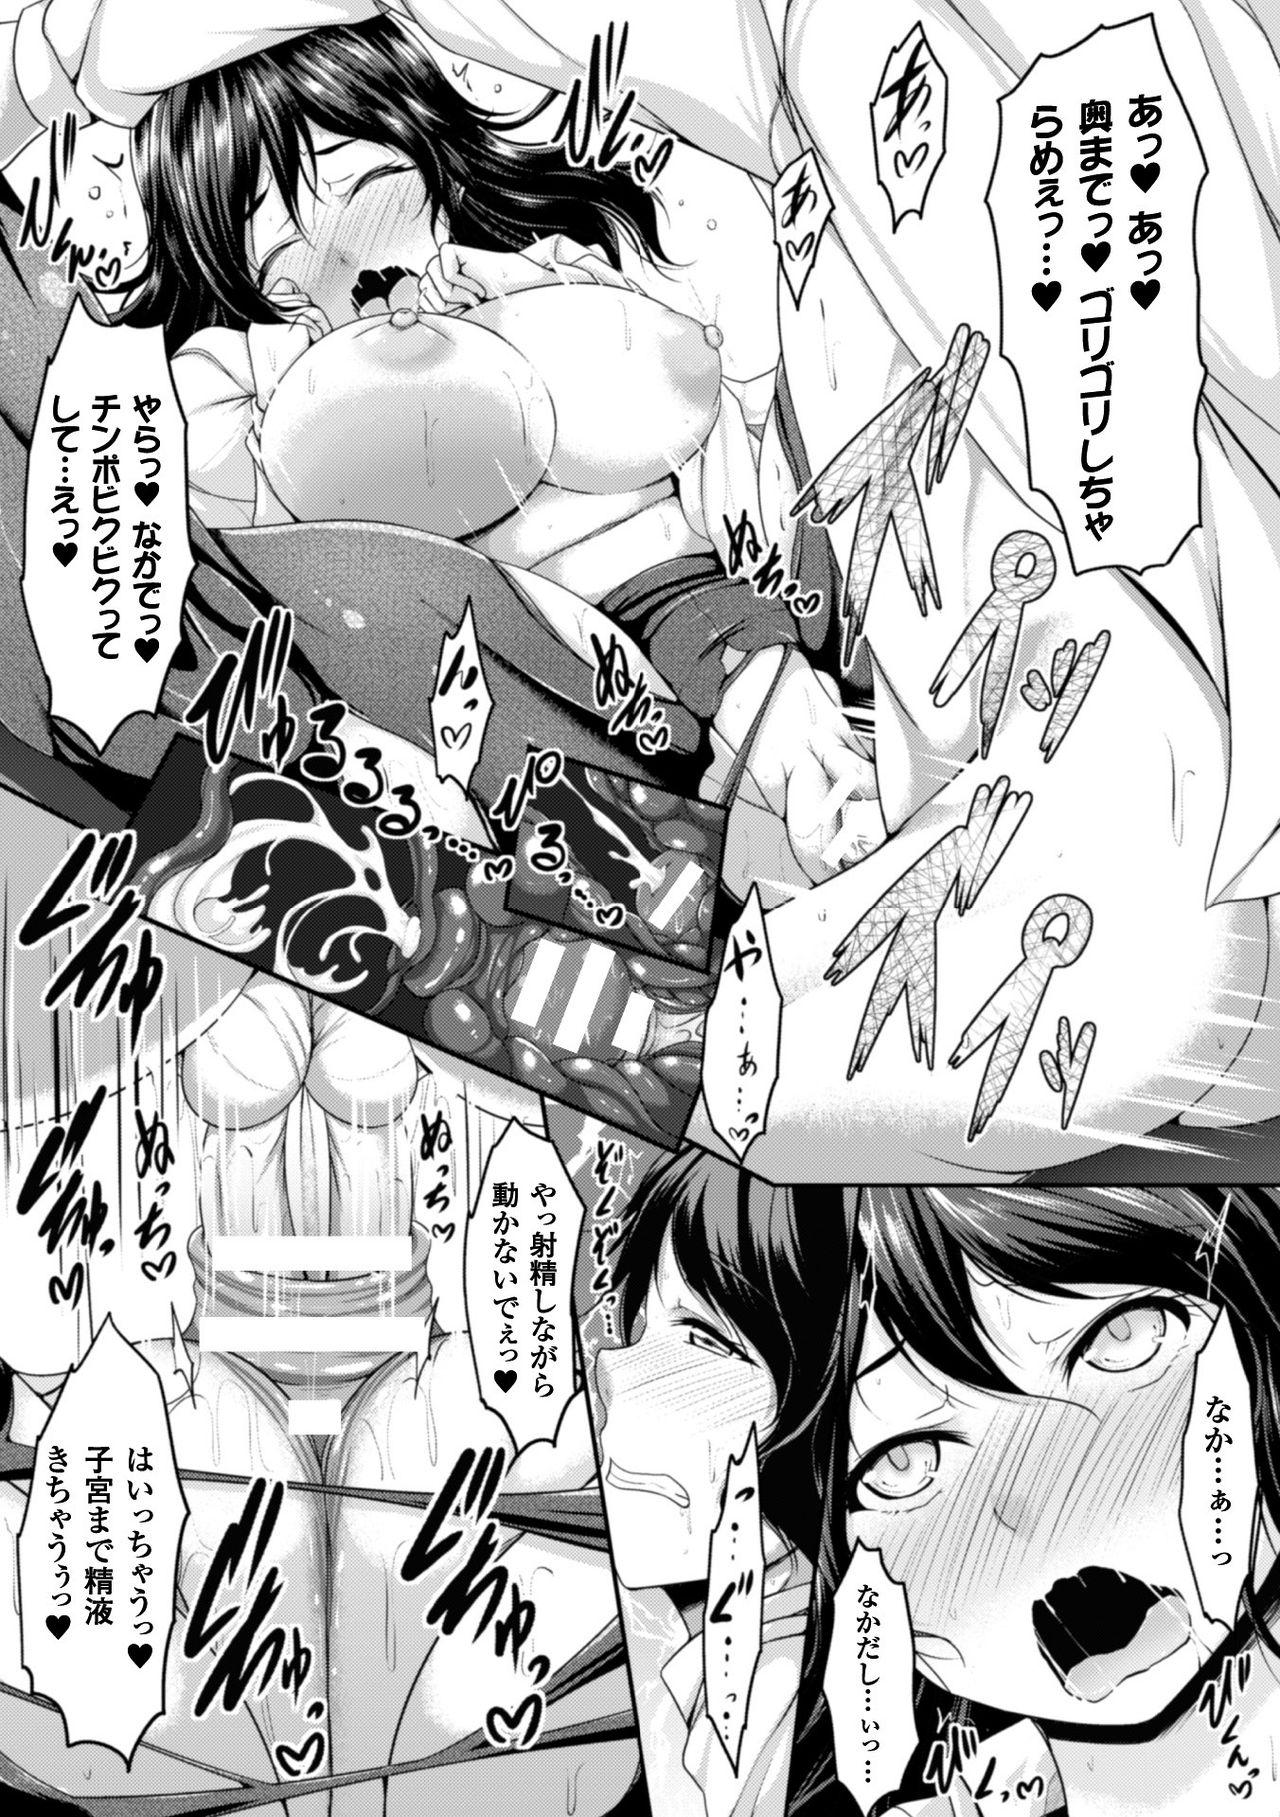 2D Comic Magazine TS Jibun Heroine mou Hitori no Ore ga Erosugite Gaman Dekinee! Vol. 1 58